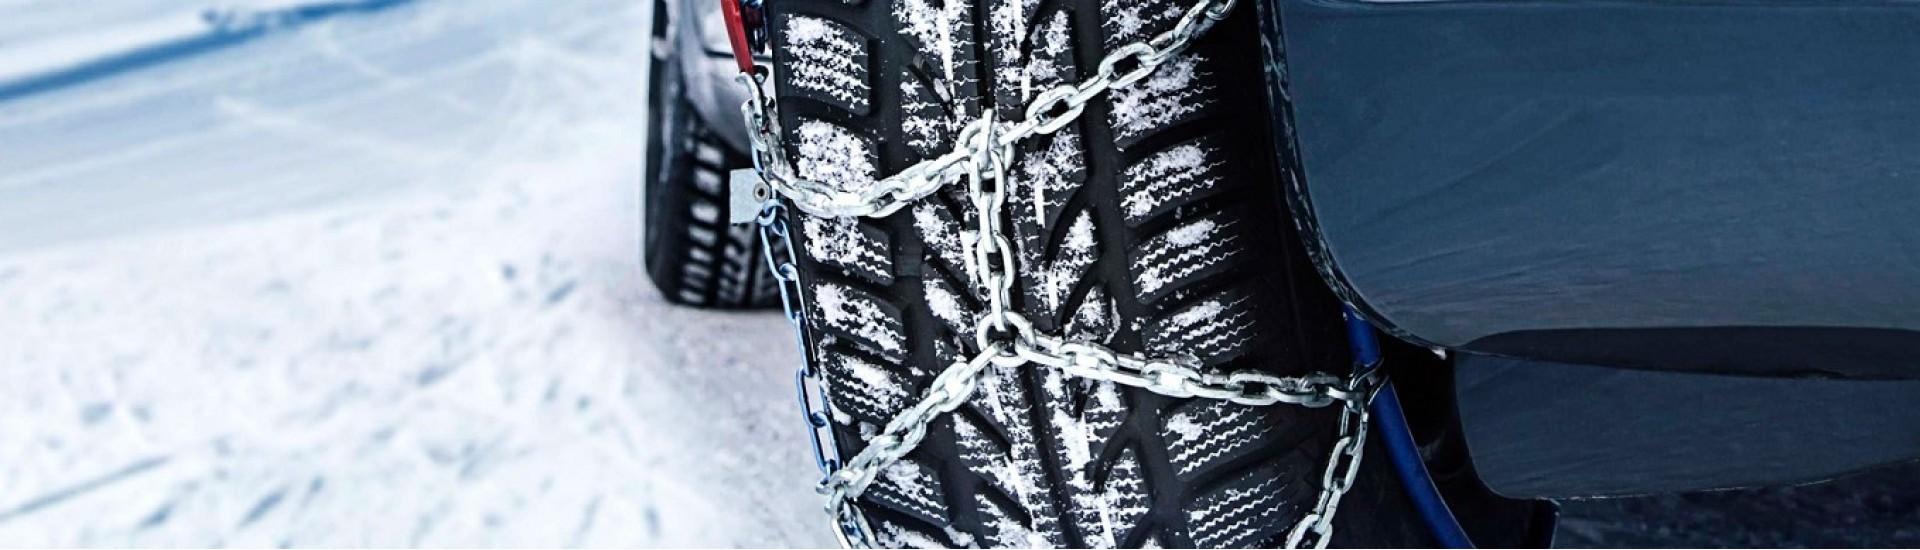 زنجیر چرخ ، قیمت زنجیر چرخ ، tire chains